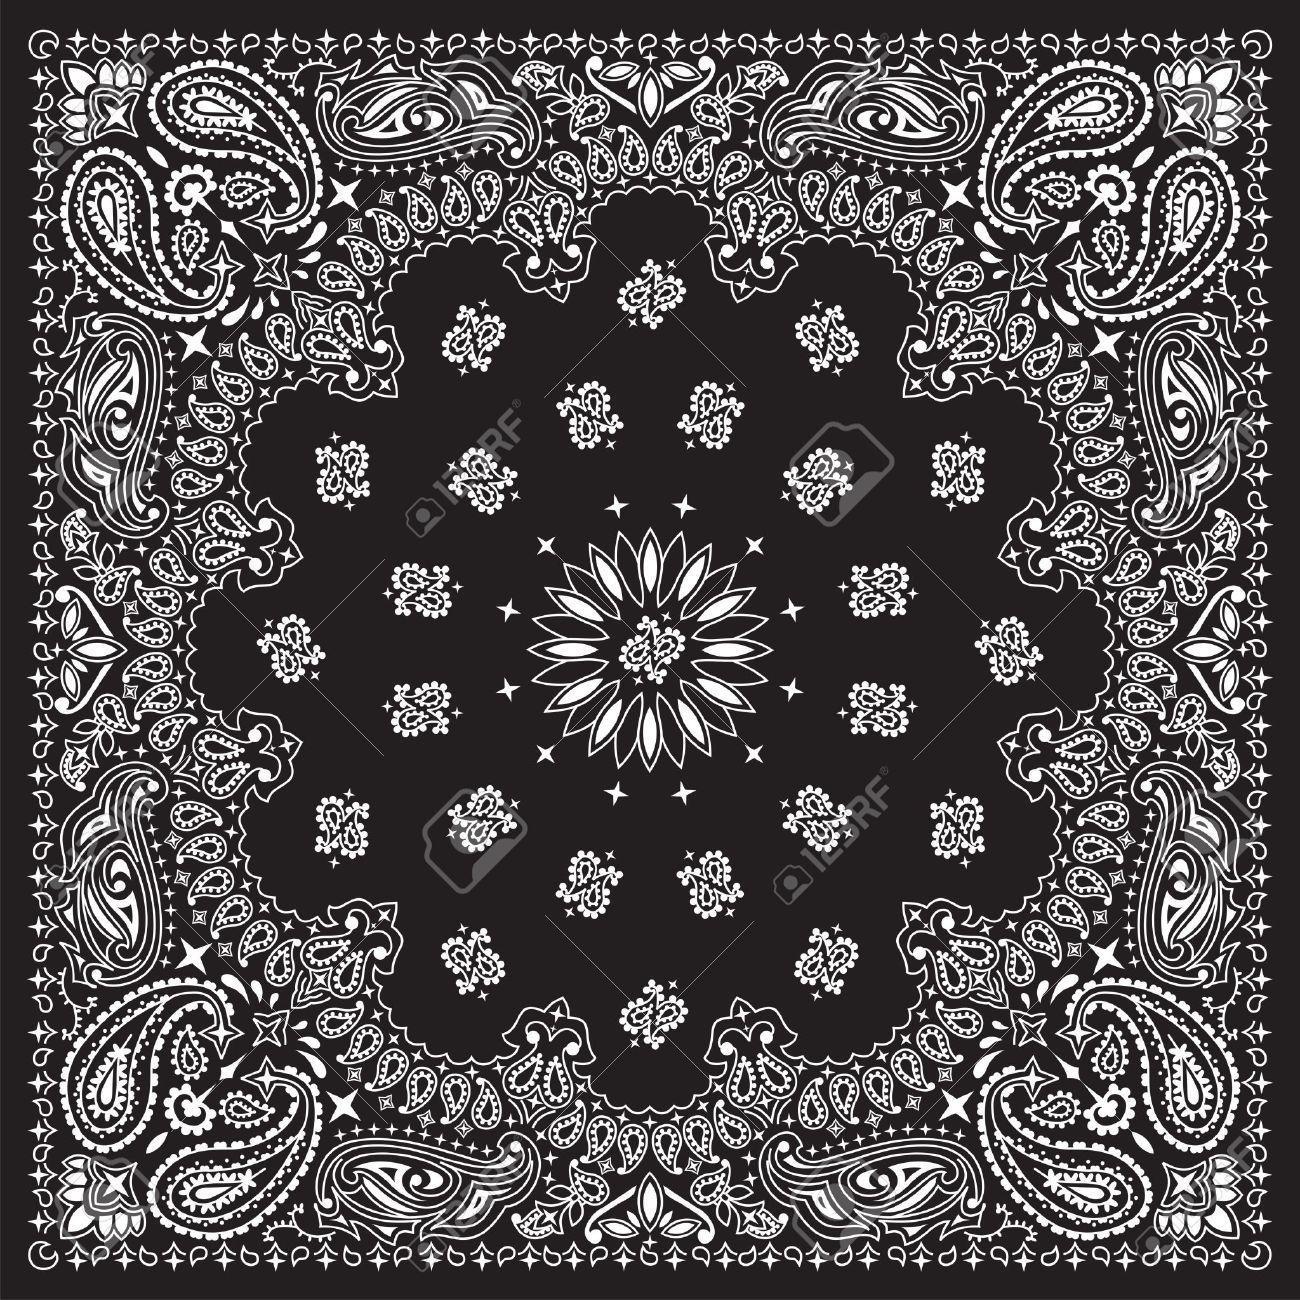 Classic Bandana Print Google Search Southwestern Art Bandana Design Traditional Duvet Covers